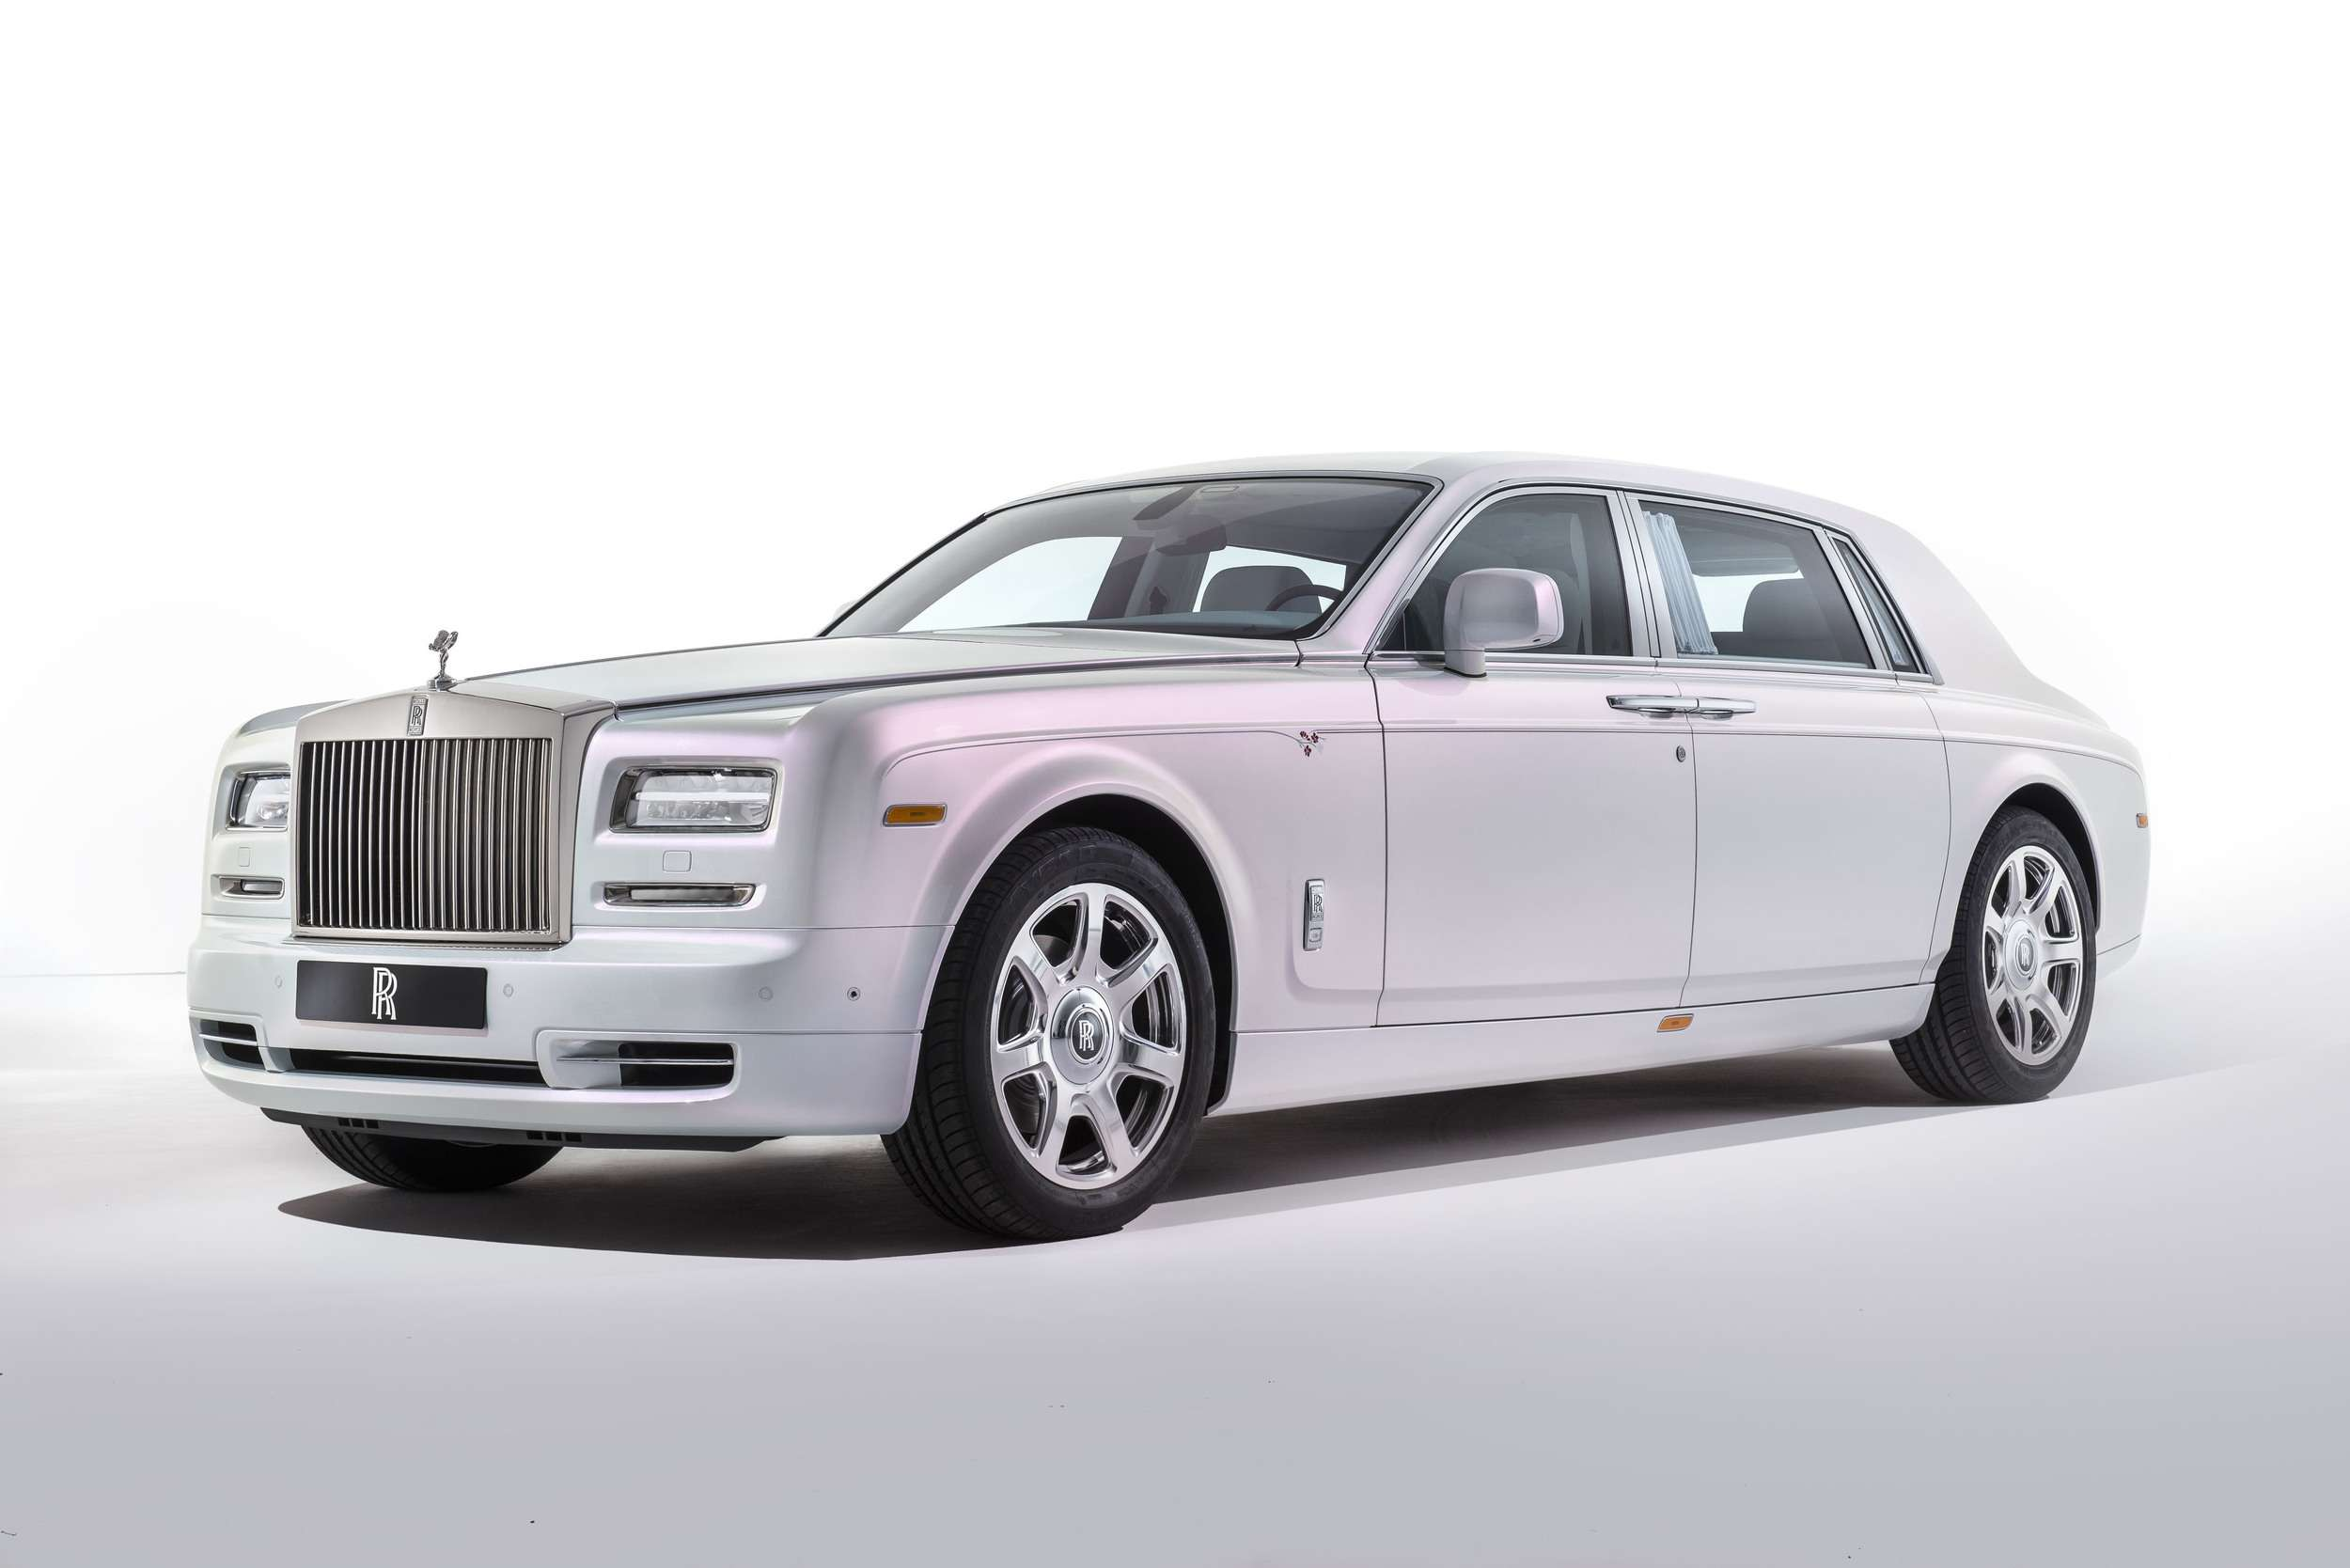 Rolls-Royce Phantom Extended Wheelbase Serenity Foto: Rolls-Royce